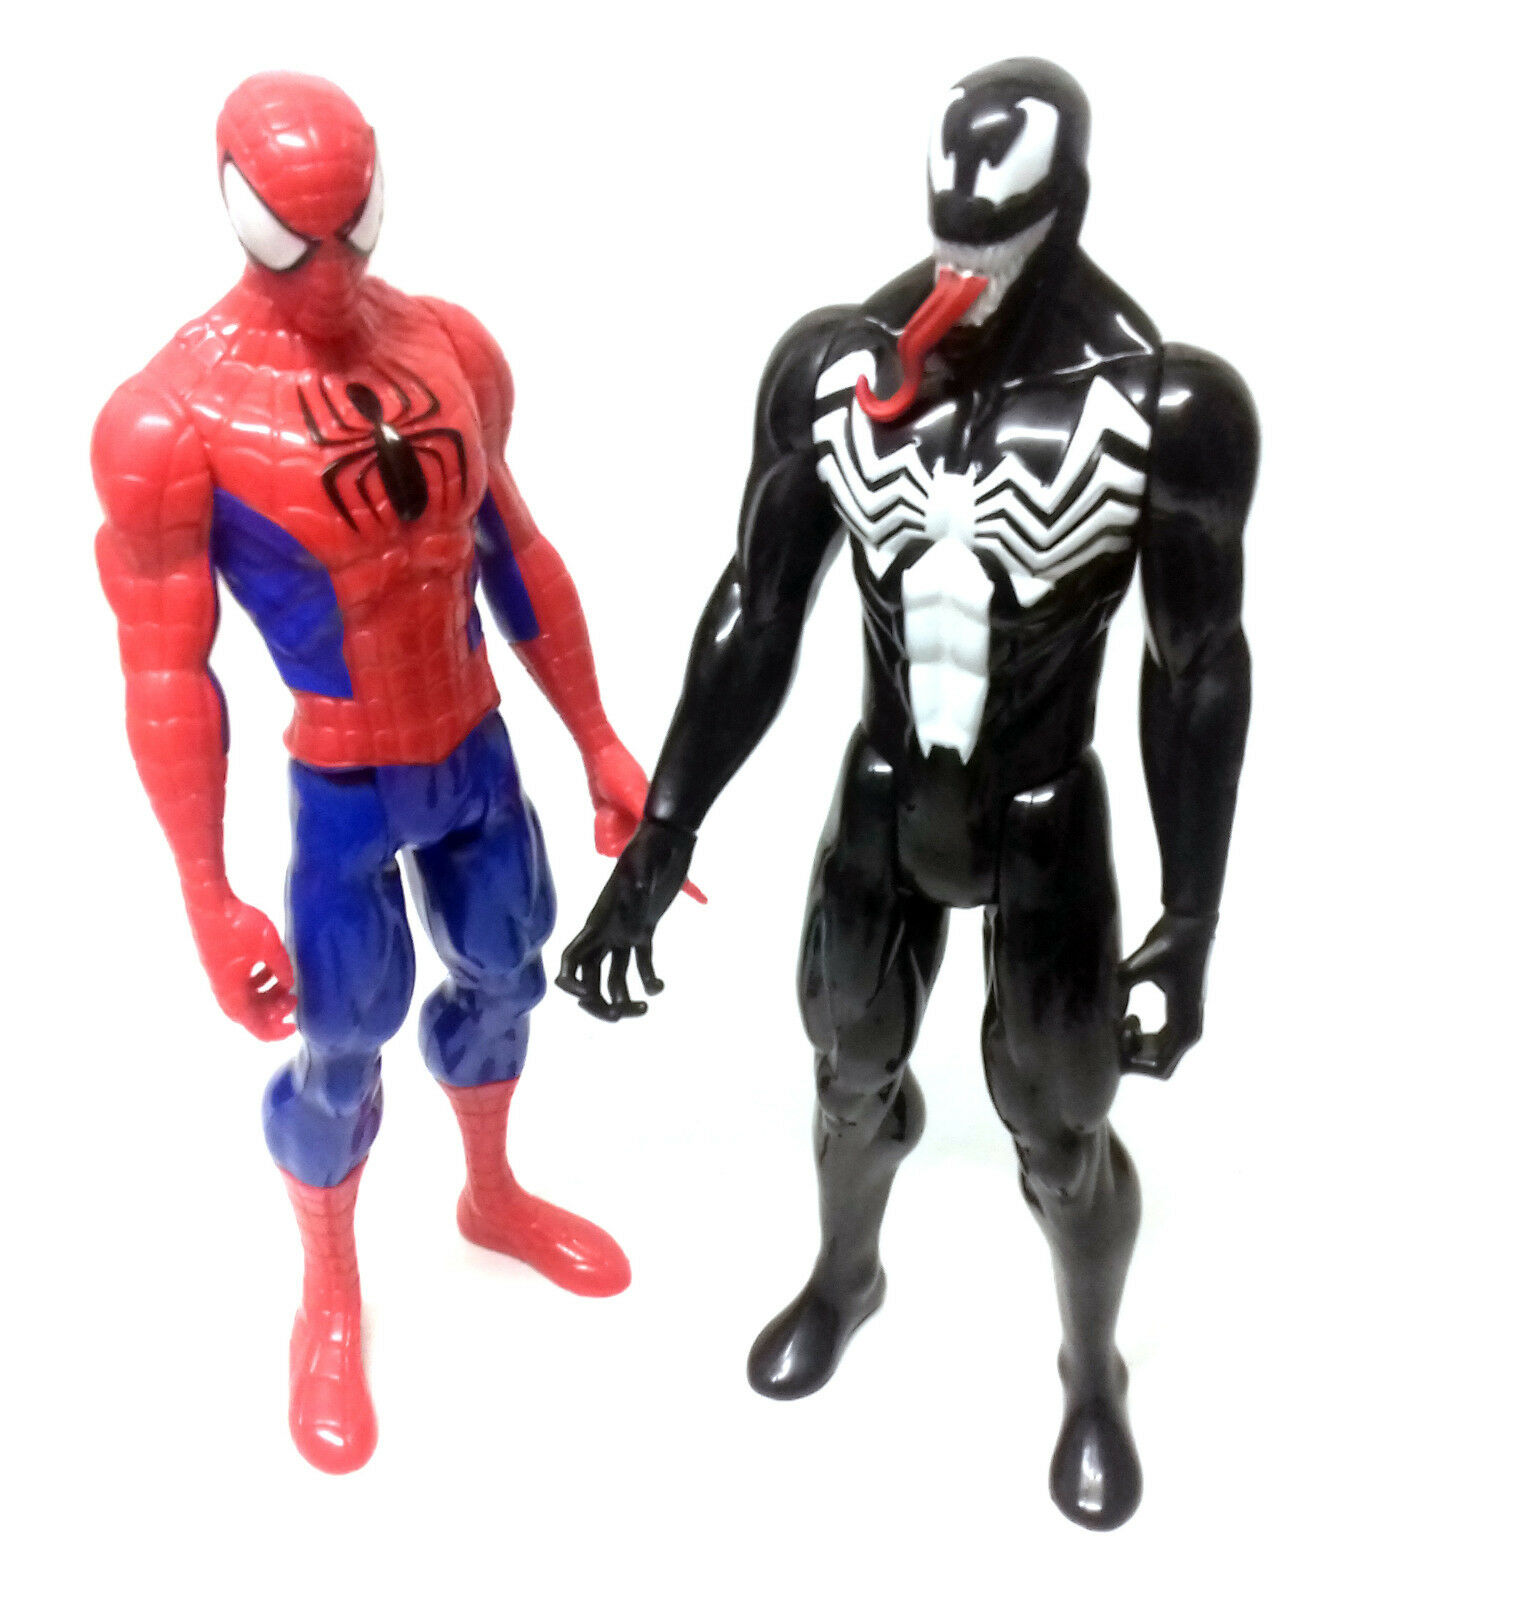 Marvel Comics SPIDERMAN SPIDERMAN SPIDERMAN v VENOM 10  titan toy figure hero & villain set bd539d